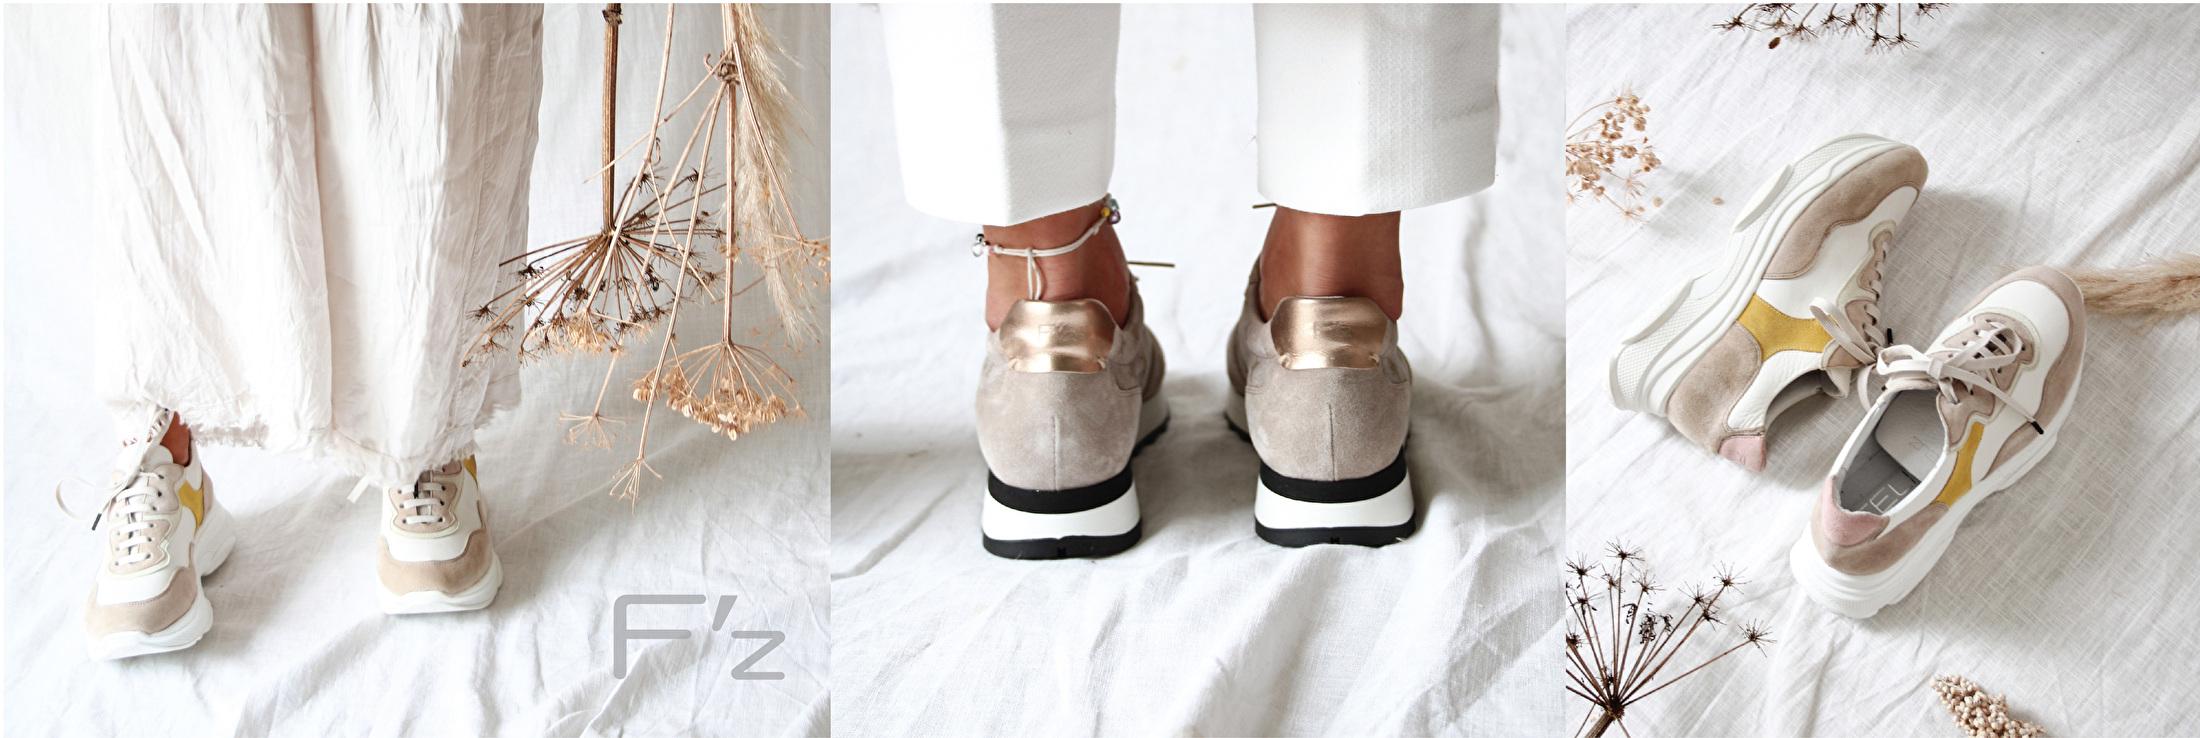 SS21 sneakers FELIZ